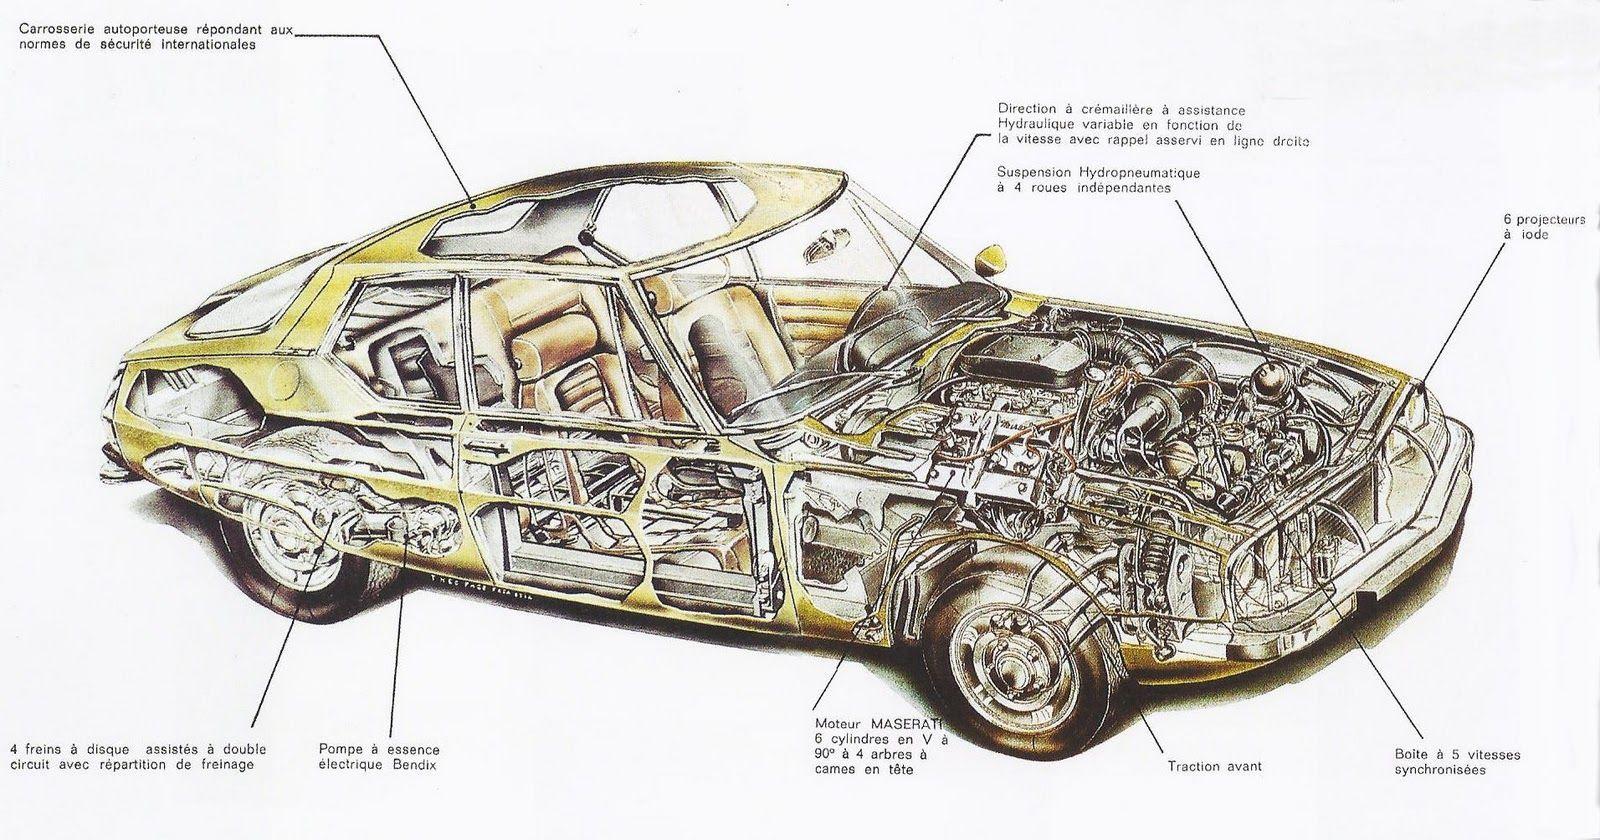 Old Car Diagram Electrical Wiring Diagrams Schematics U2022 Rh Seniorlivinguniversity Co Engine